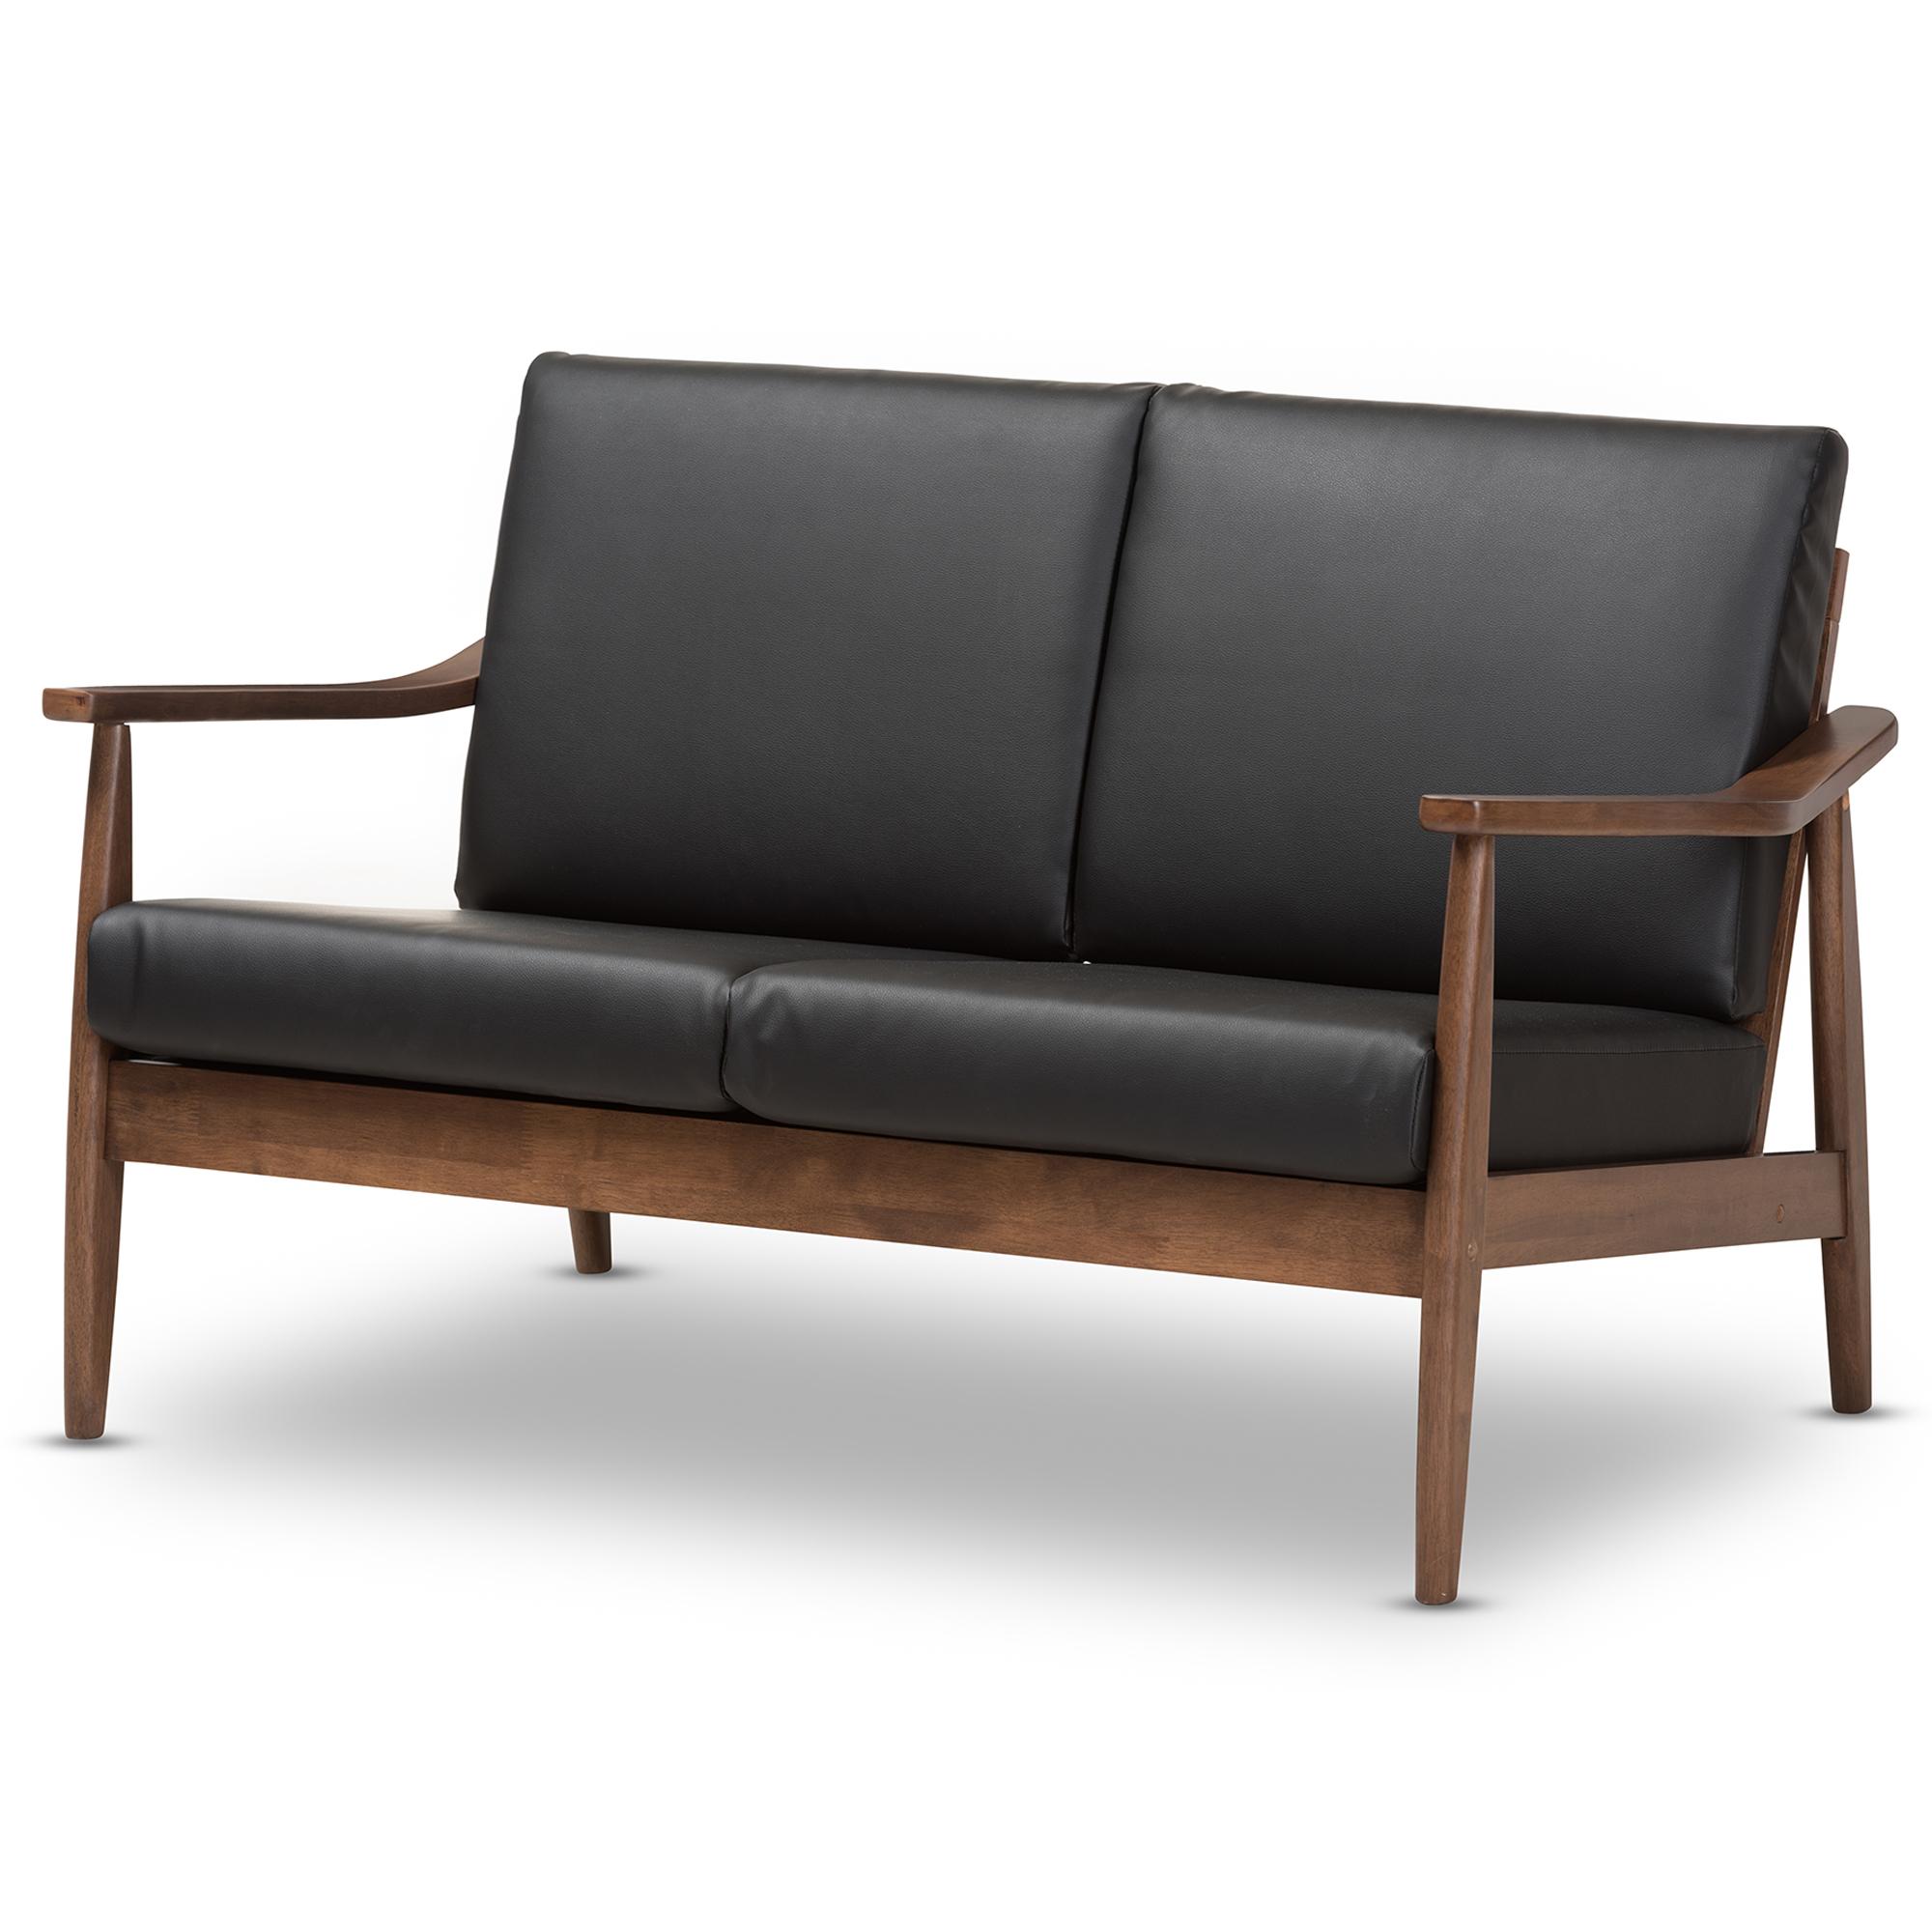 Baxton Studio Venza Mid Century Modern Walnut Wood Black Faux Leather  2 Seater Loveseat ...